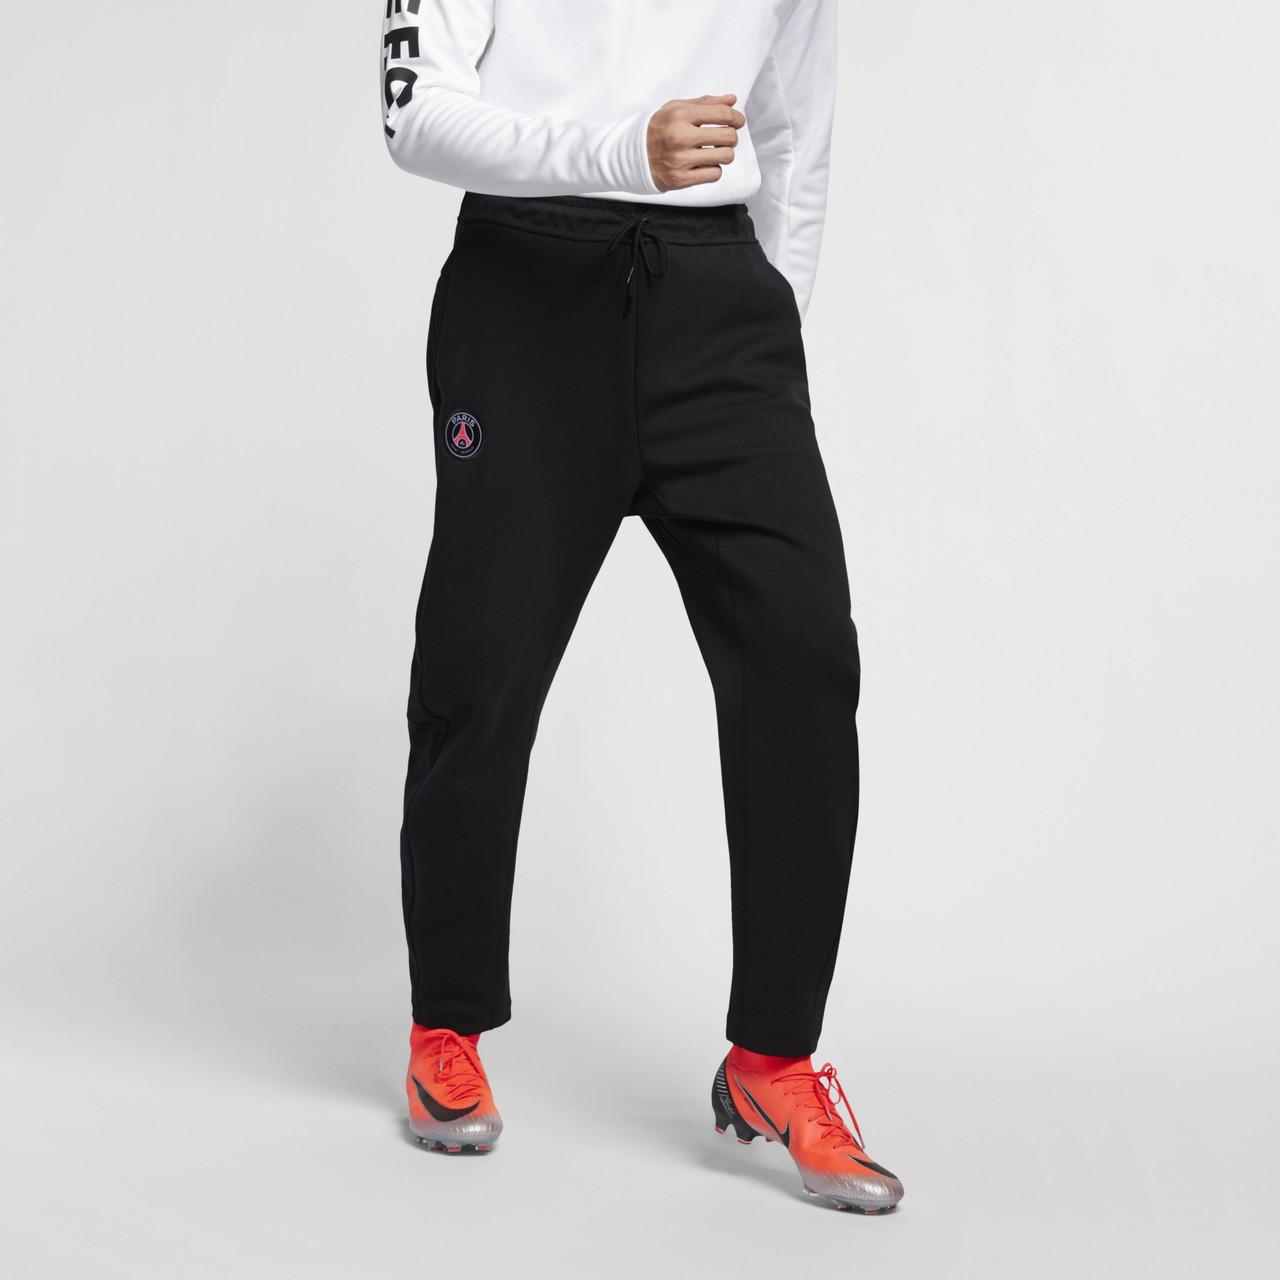 Штаны Nike Paris St-Germain 2018/19 NSW Authentic Tech Fleece. Оригинал